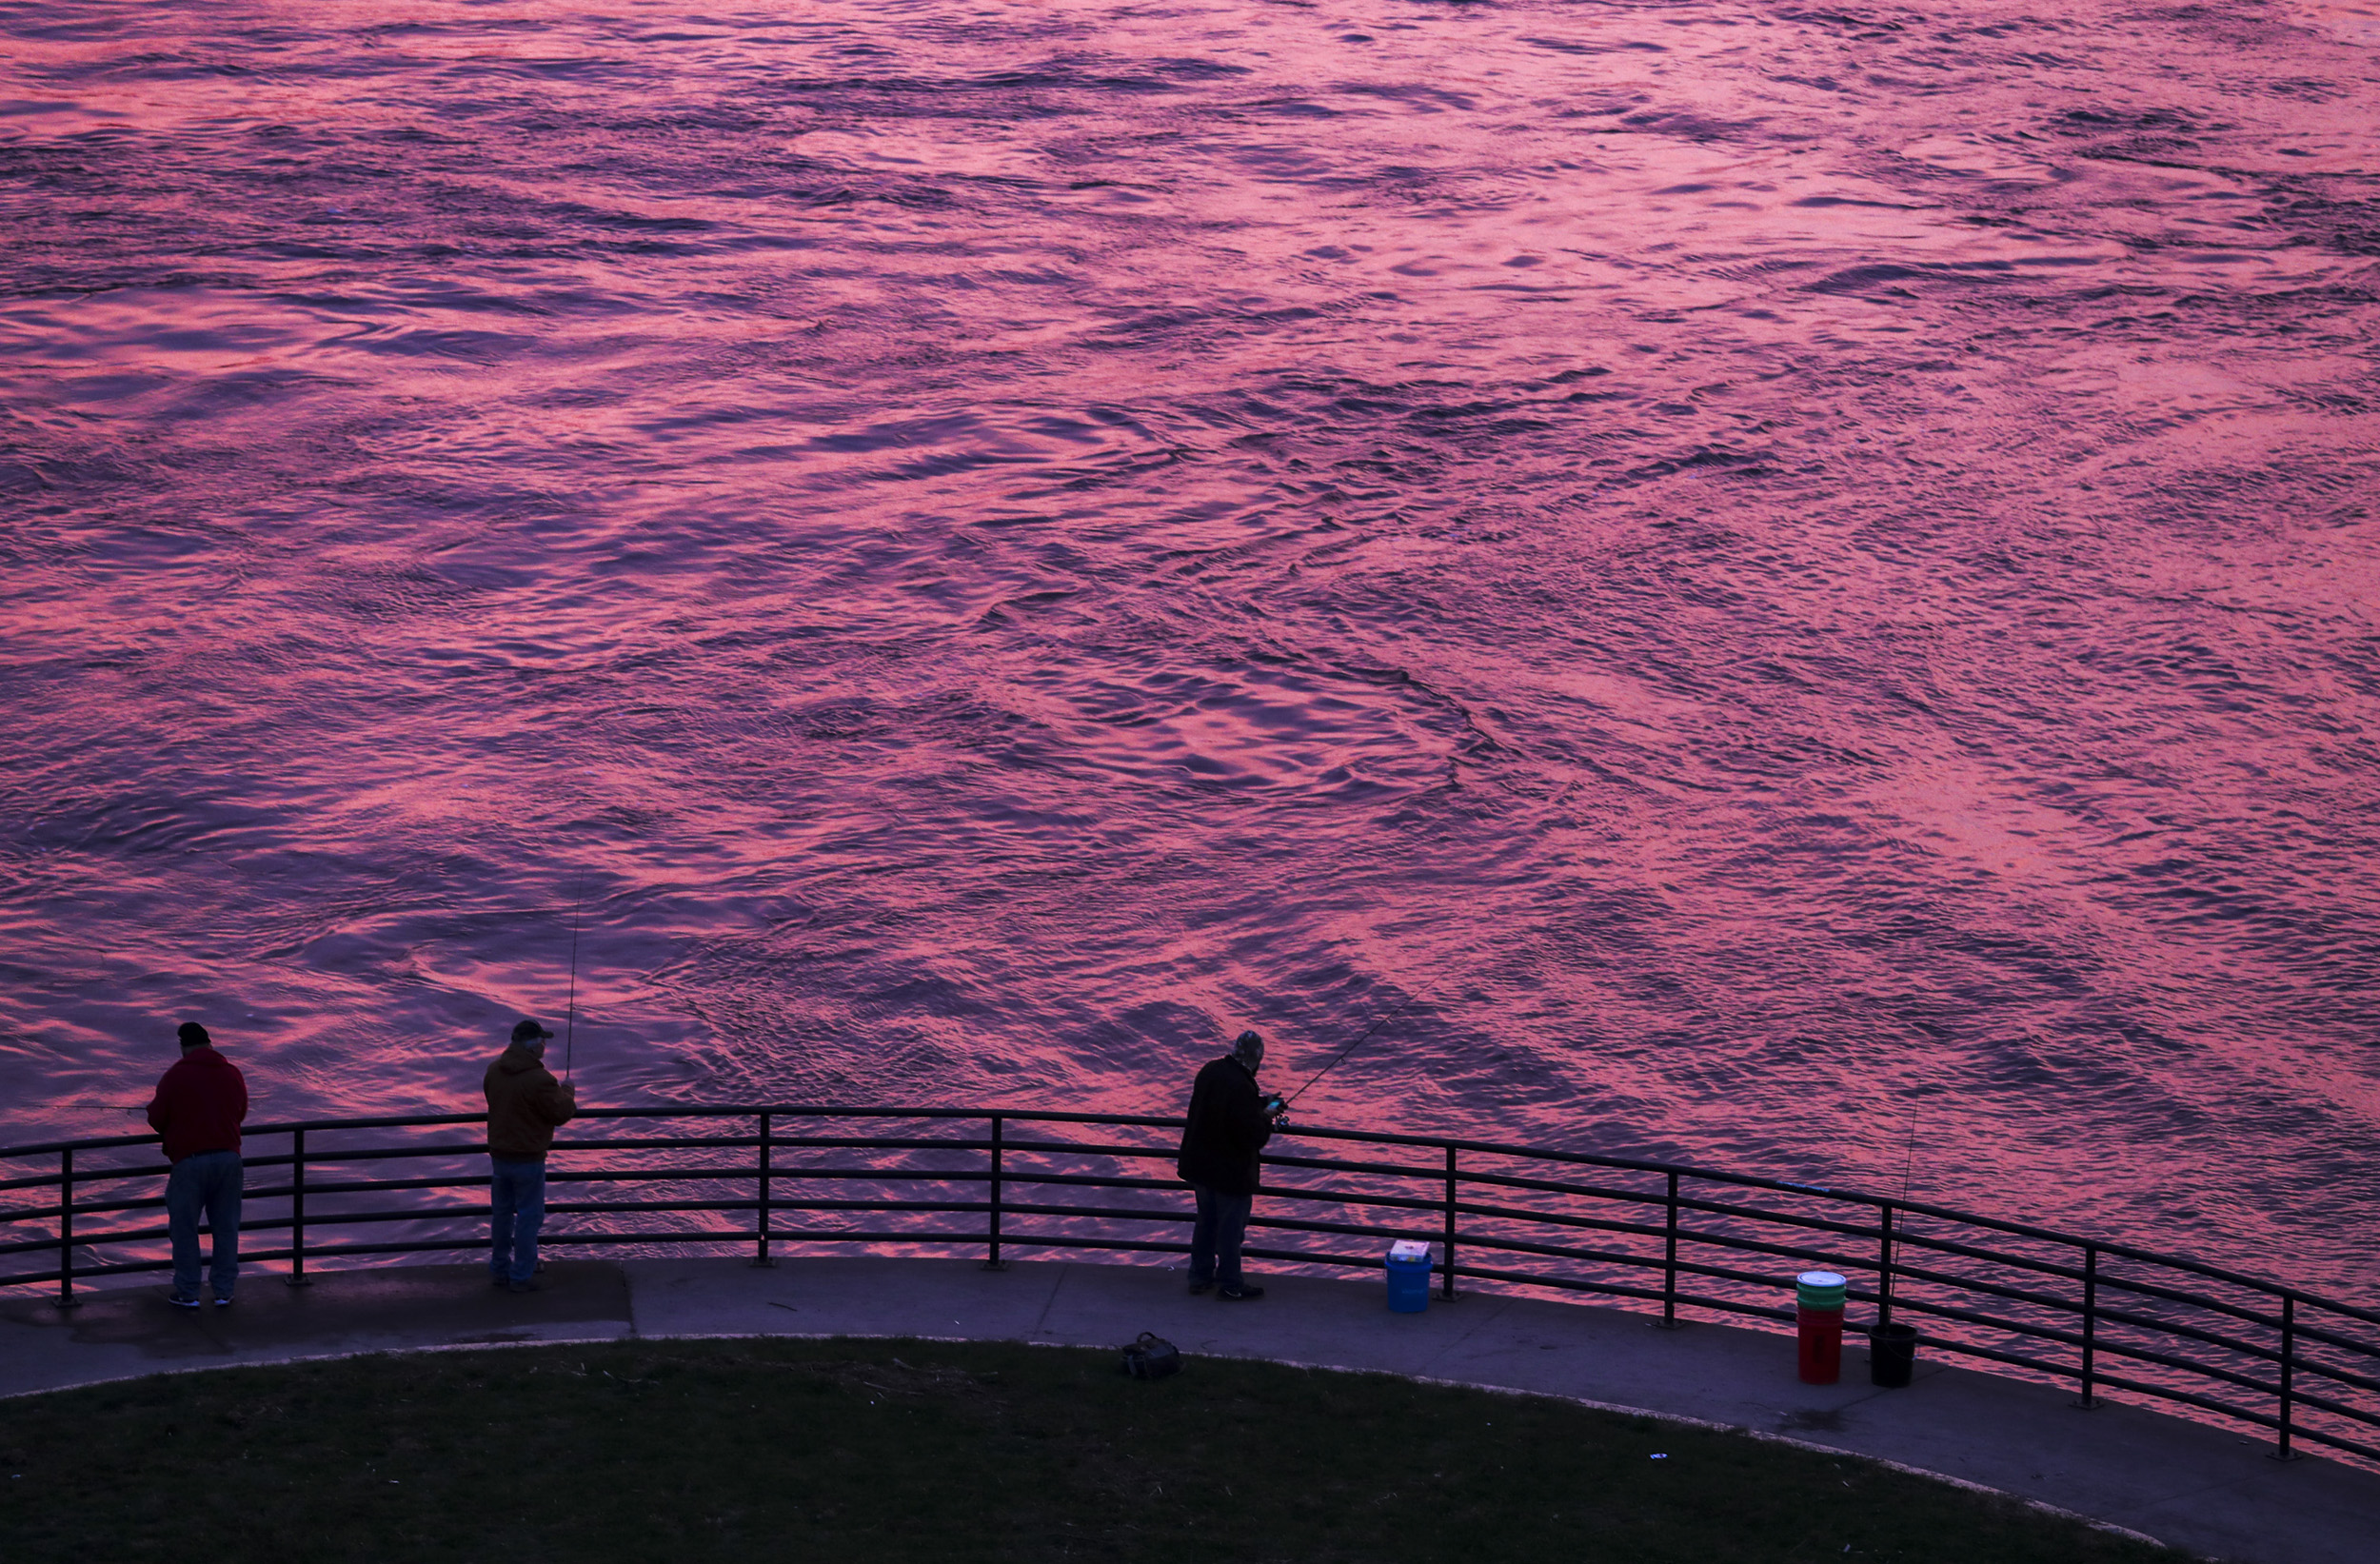 Fishermen cast their lines in the Mississippi River as the sun sets in Davenport, Thursday, Nov. 1, 2018.